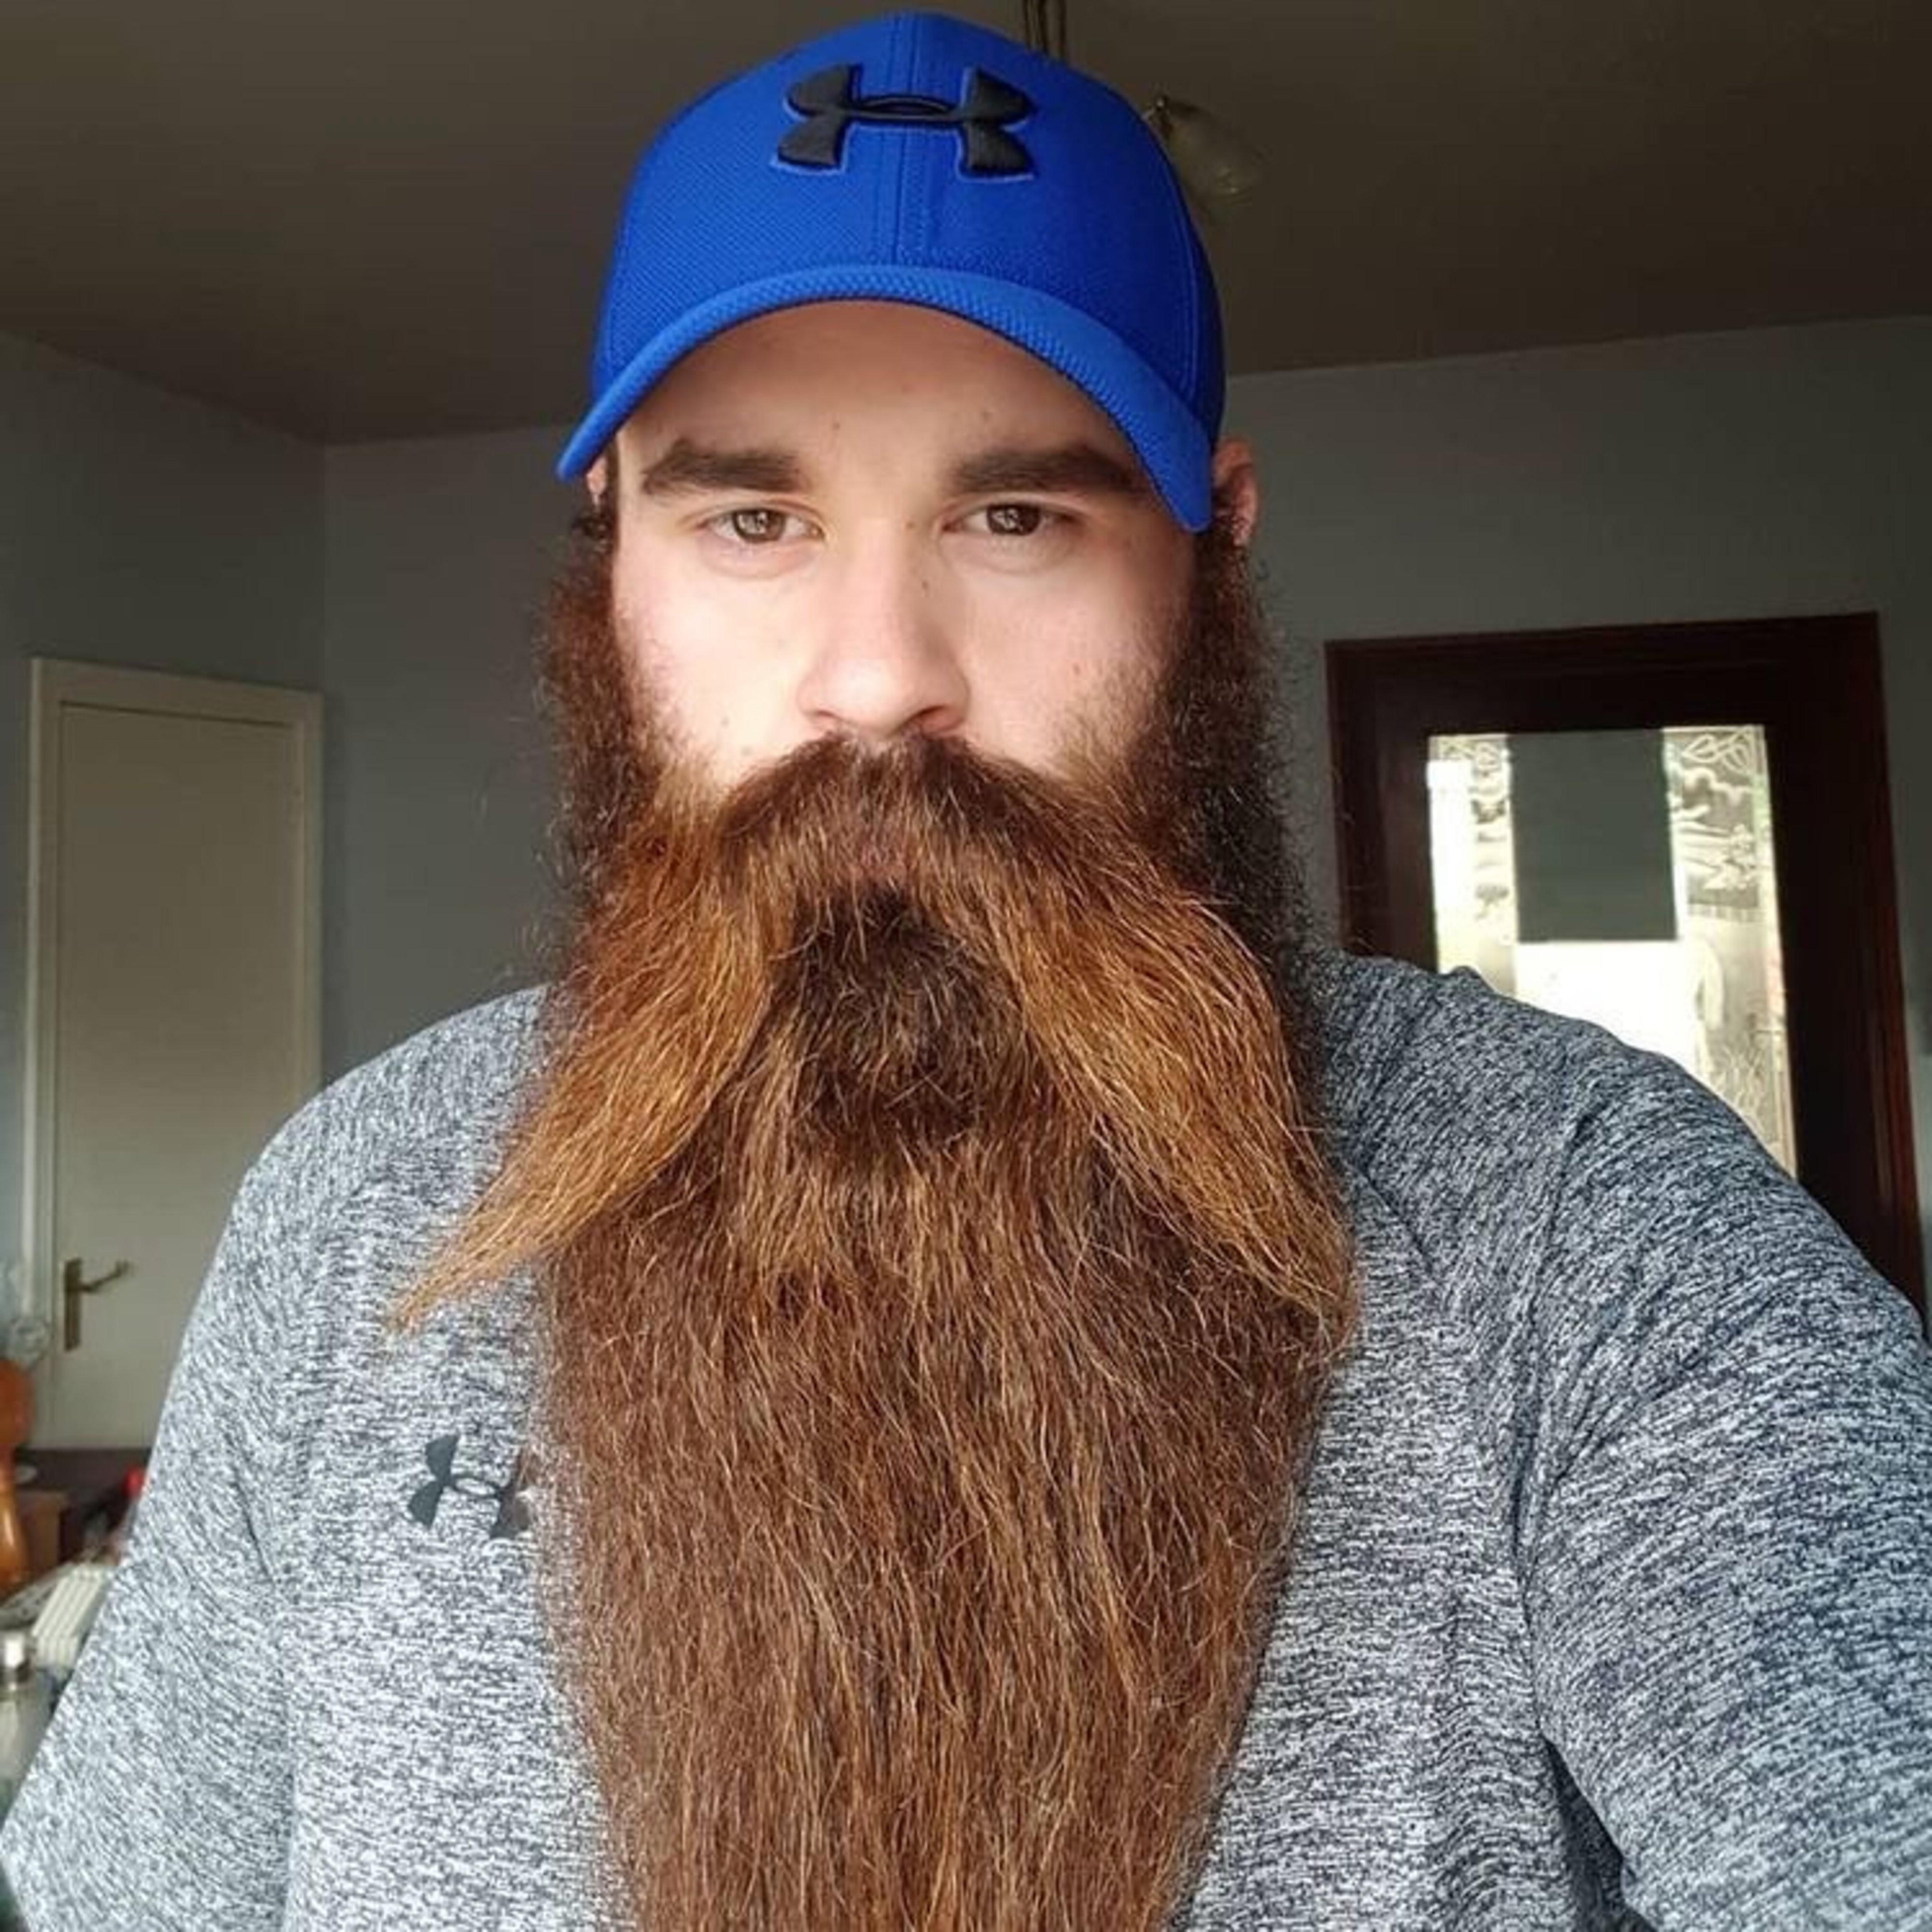 A really long stylish beard for males.